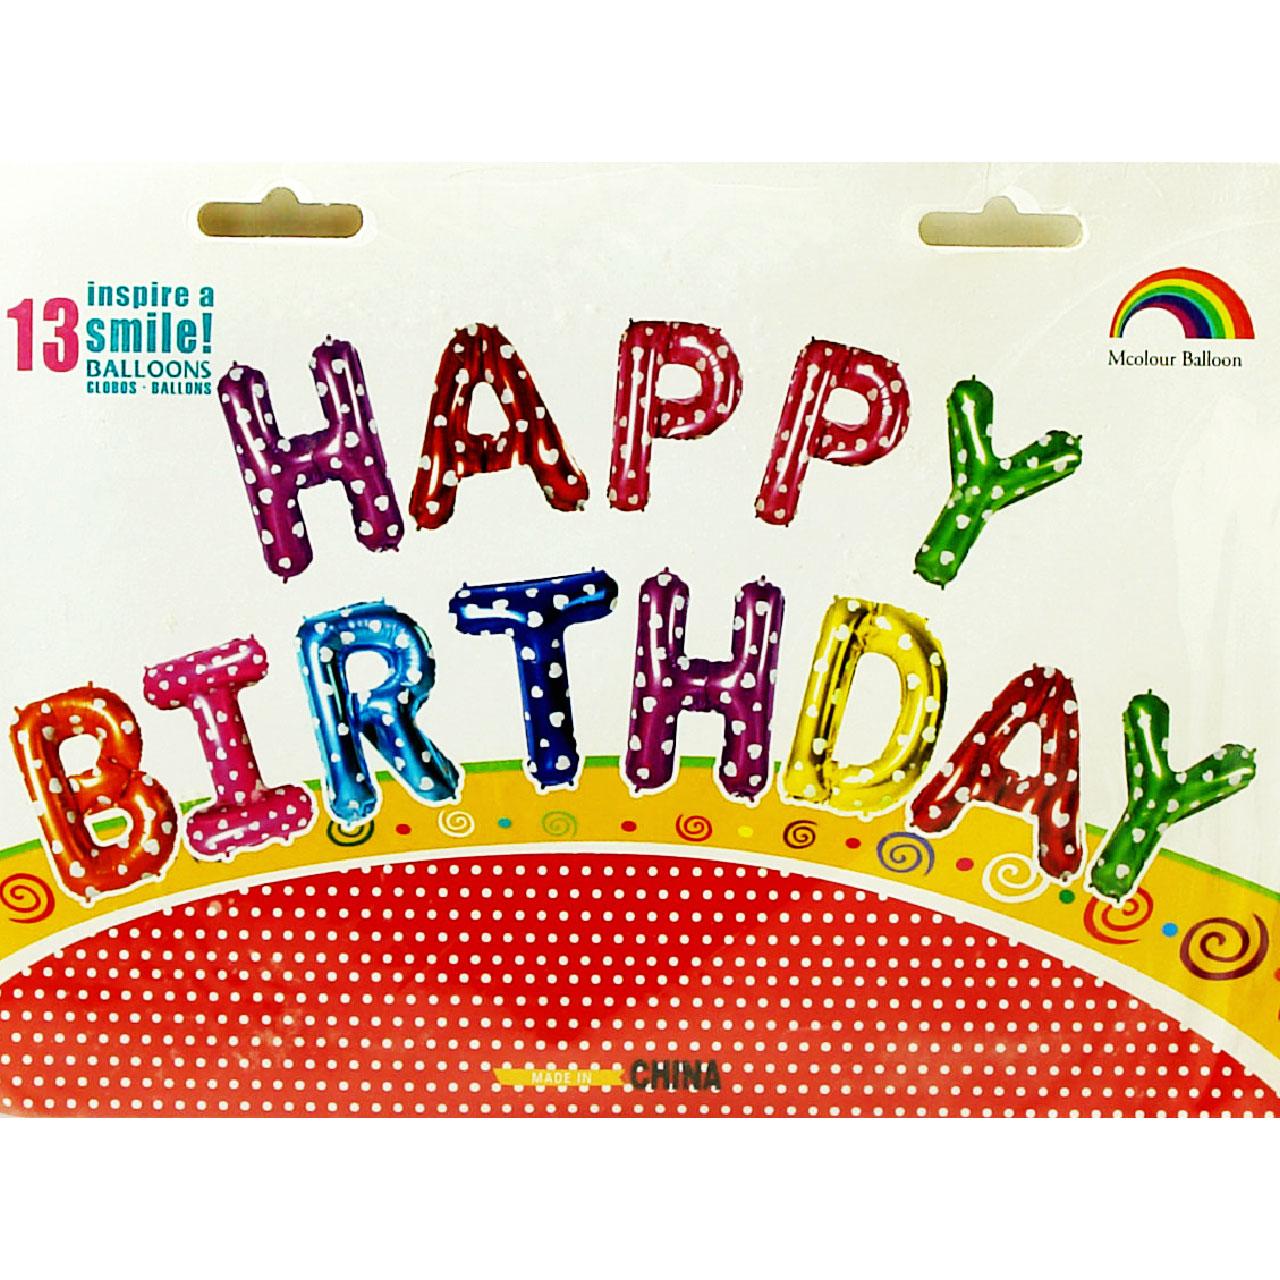 بادکنک فویلی ام کالر بالن مدل Heart Happy Birthday